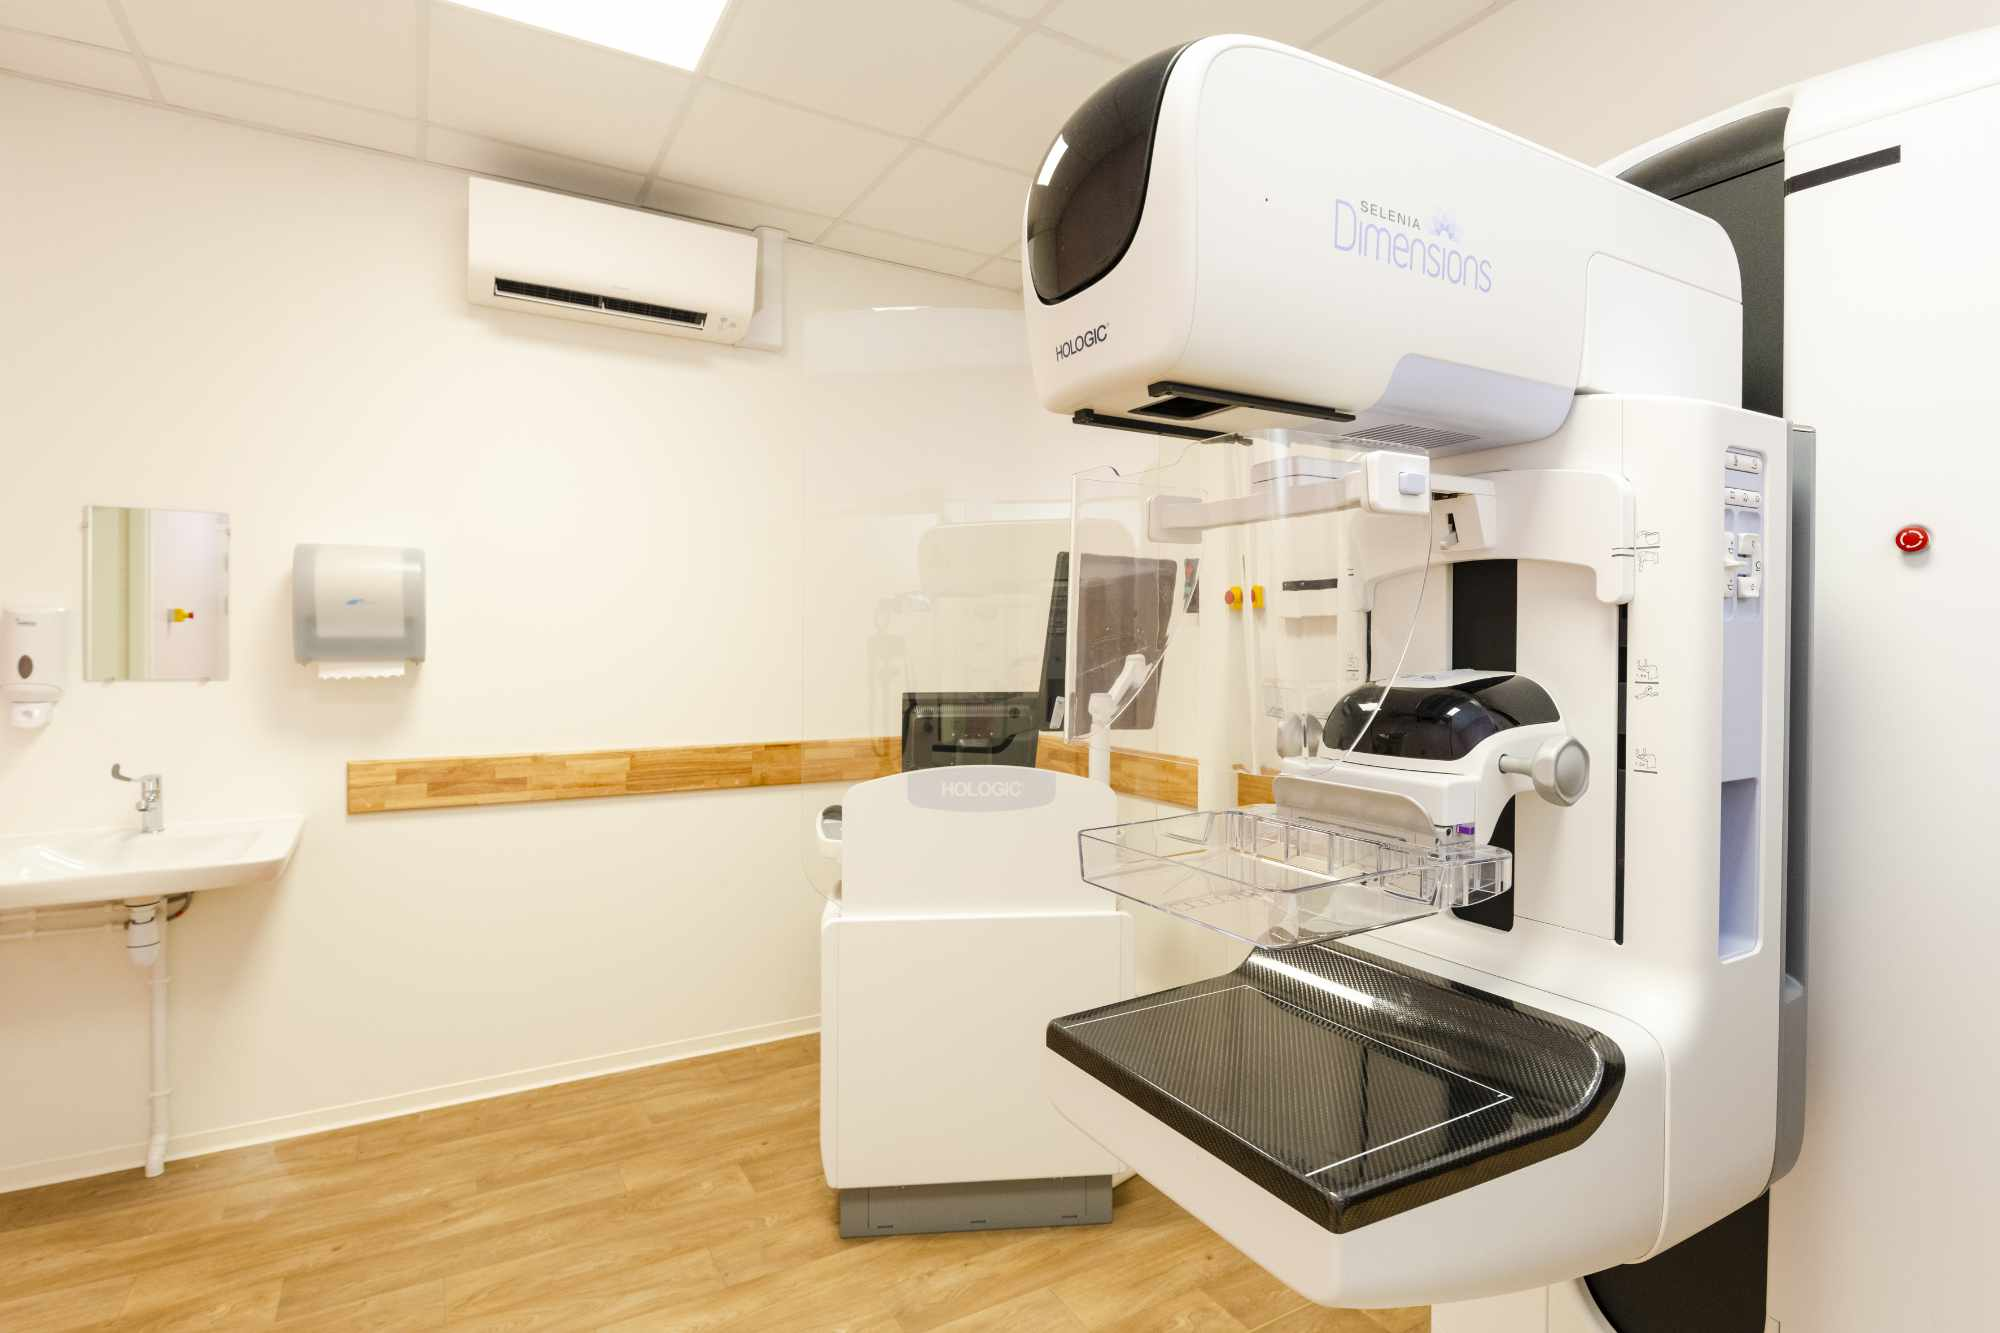 Hôpital Issoire